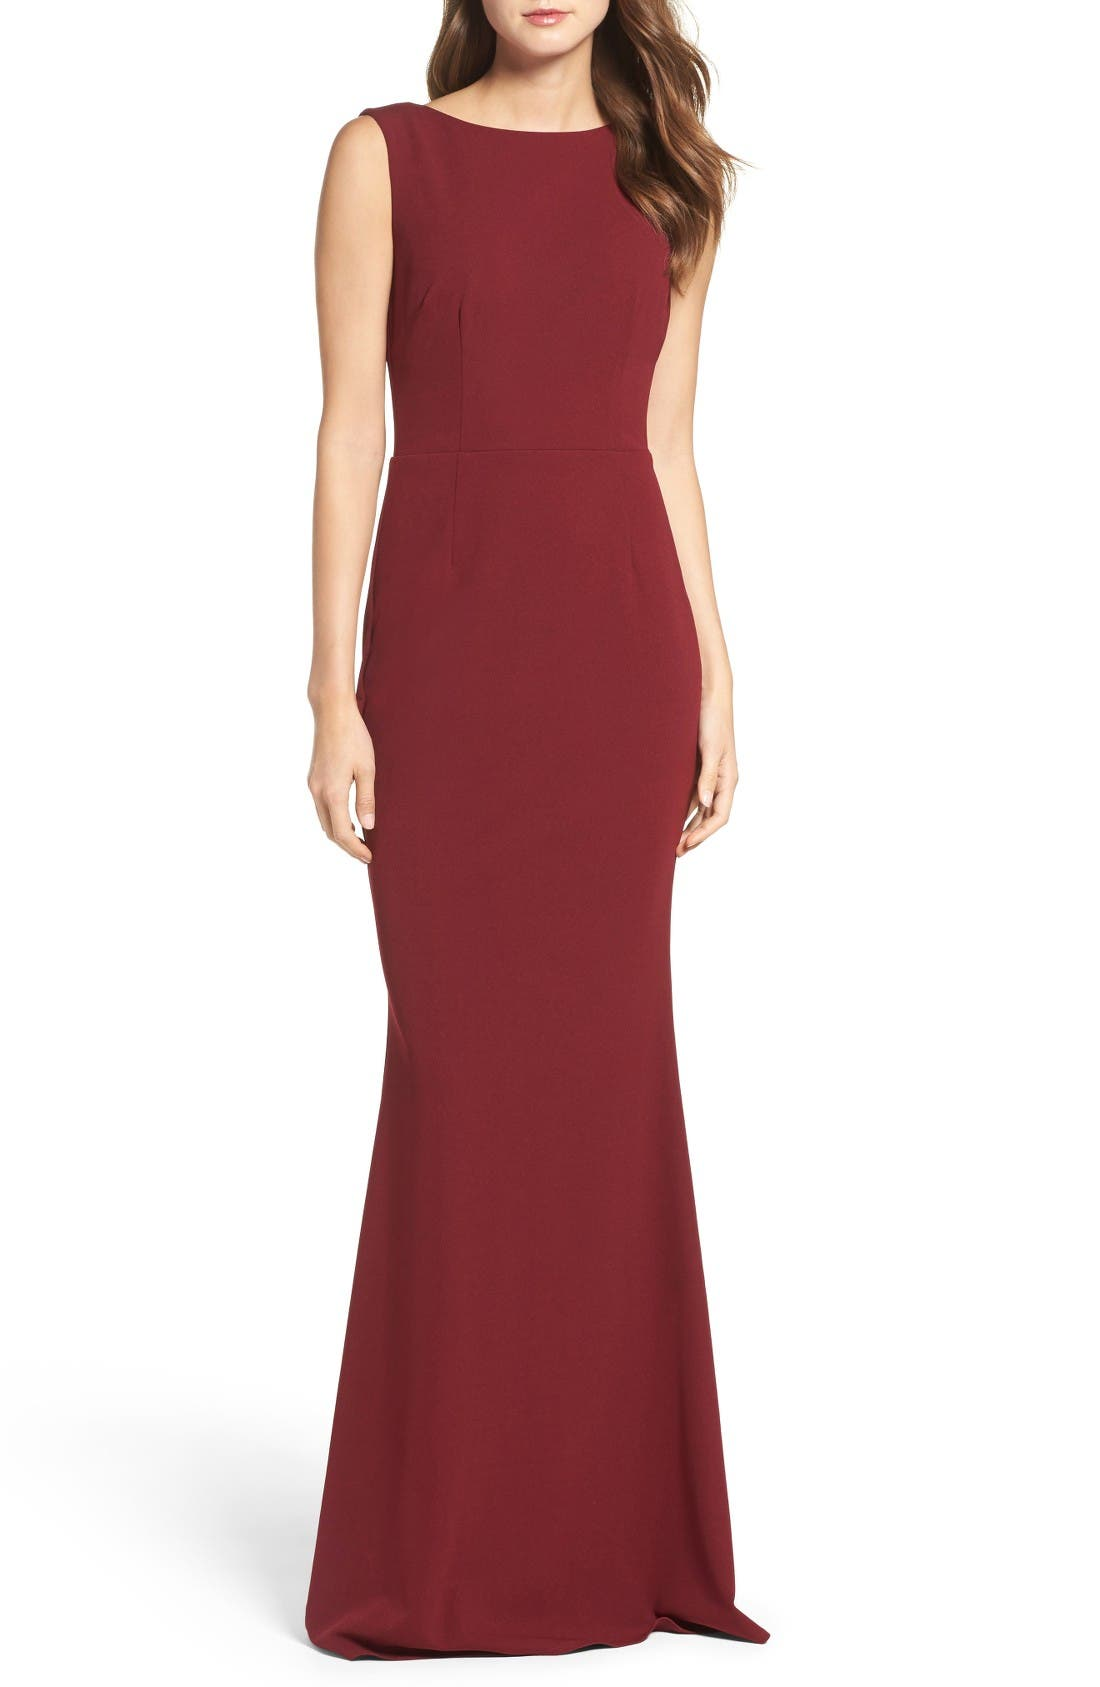 Black Long Evening Dresses Under $150